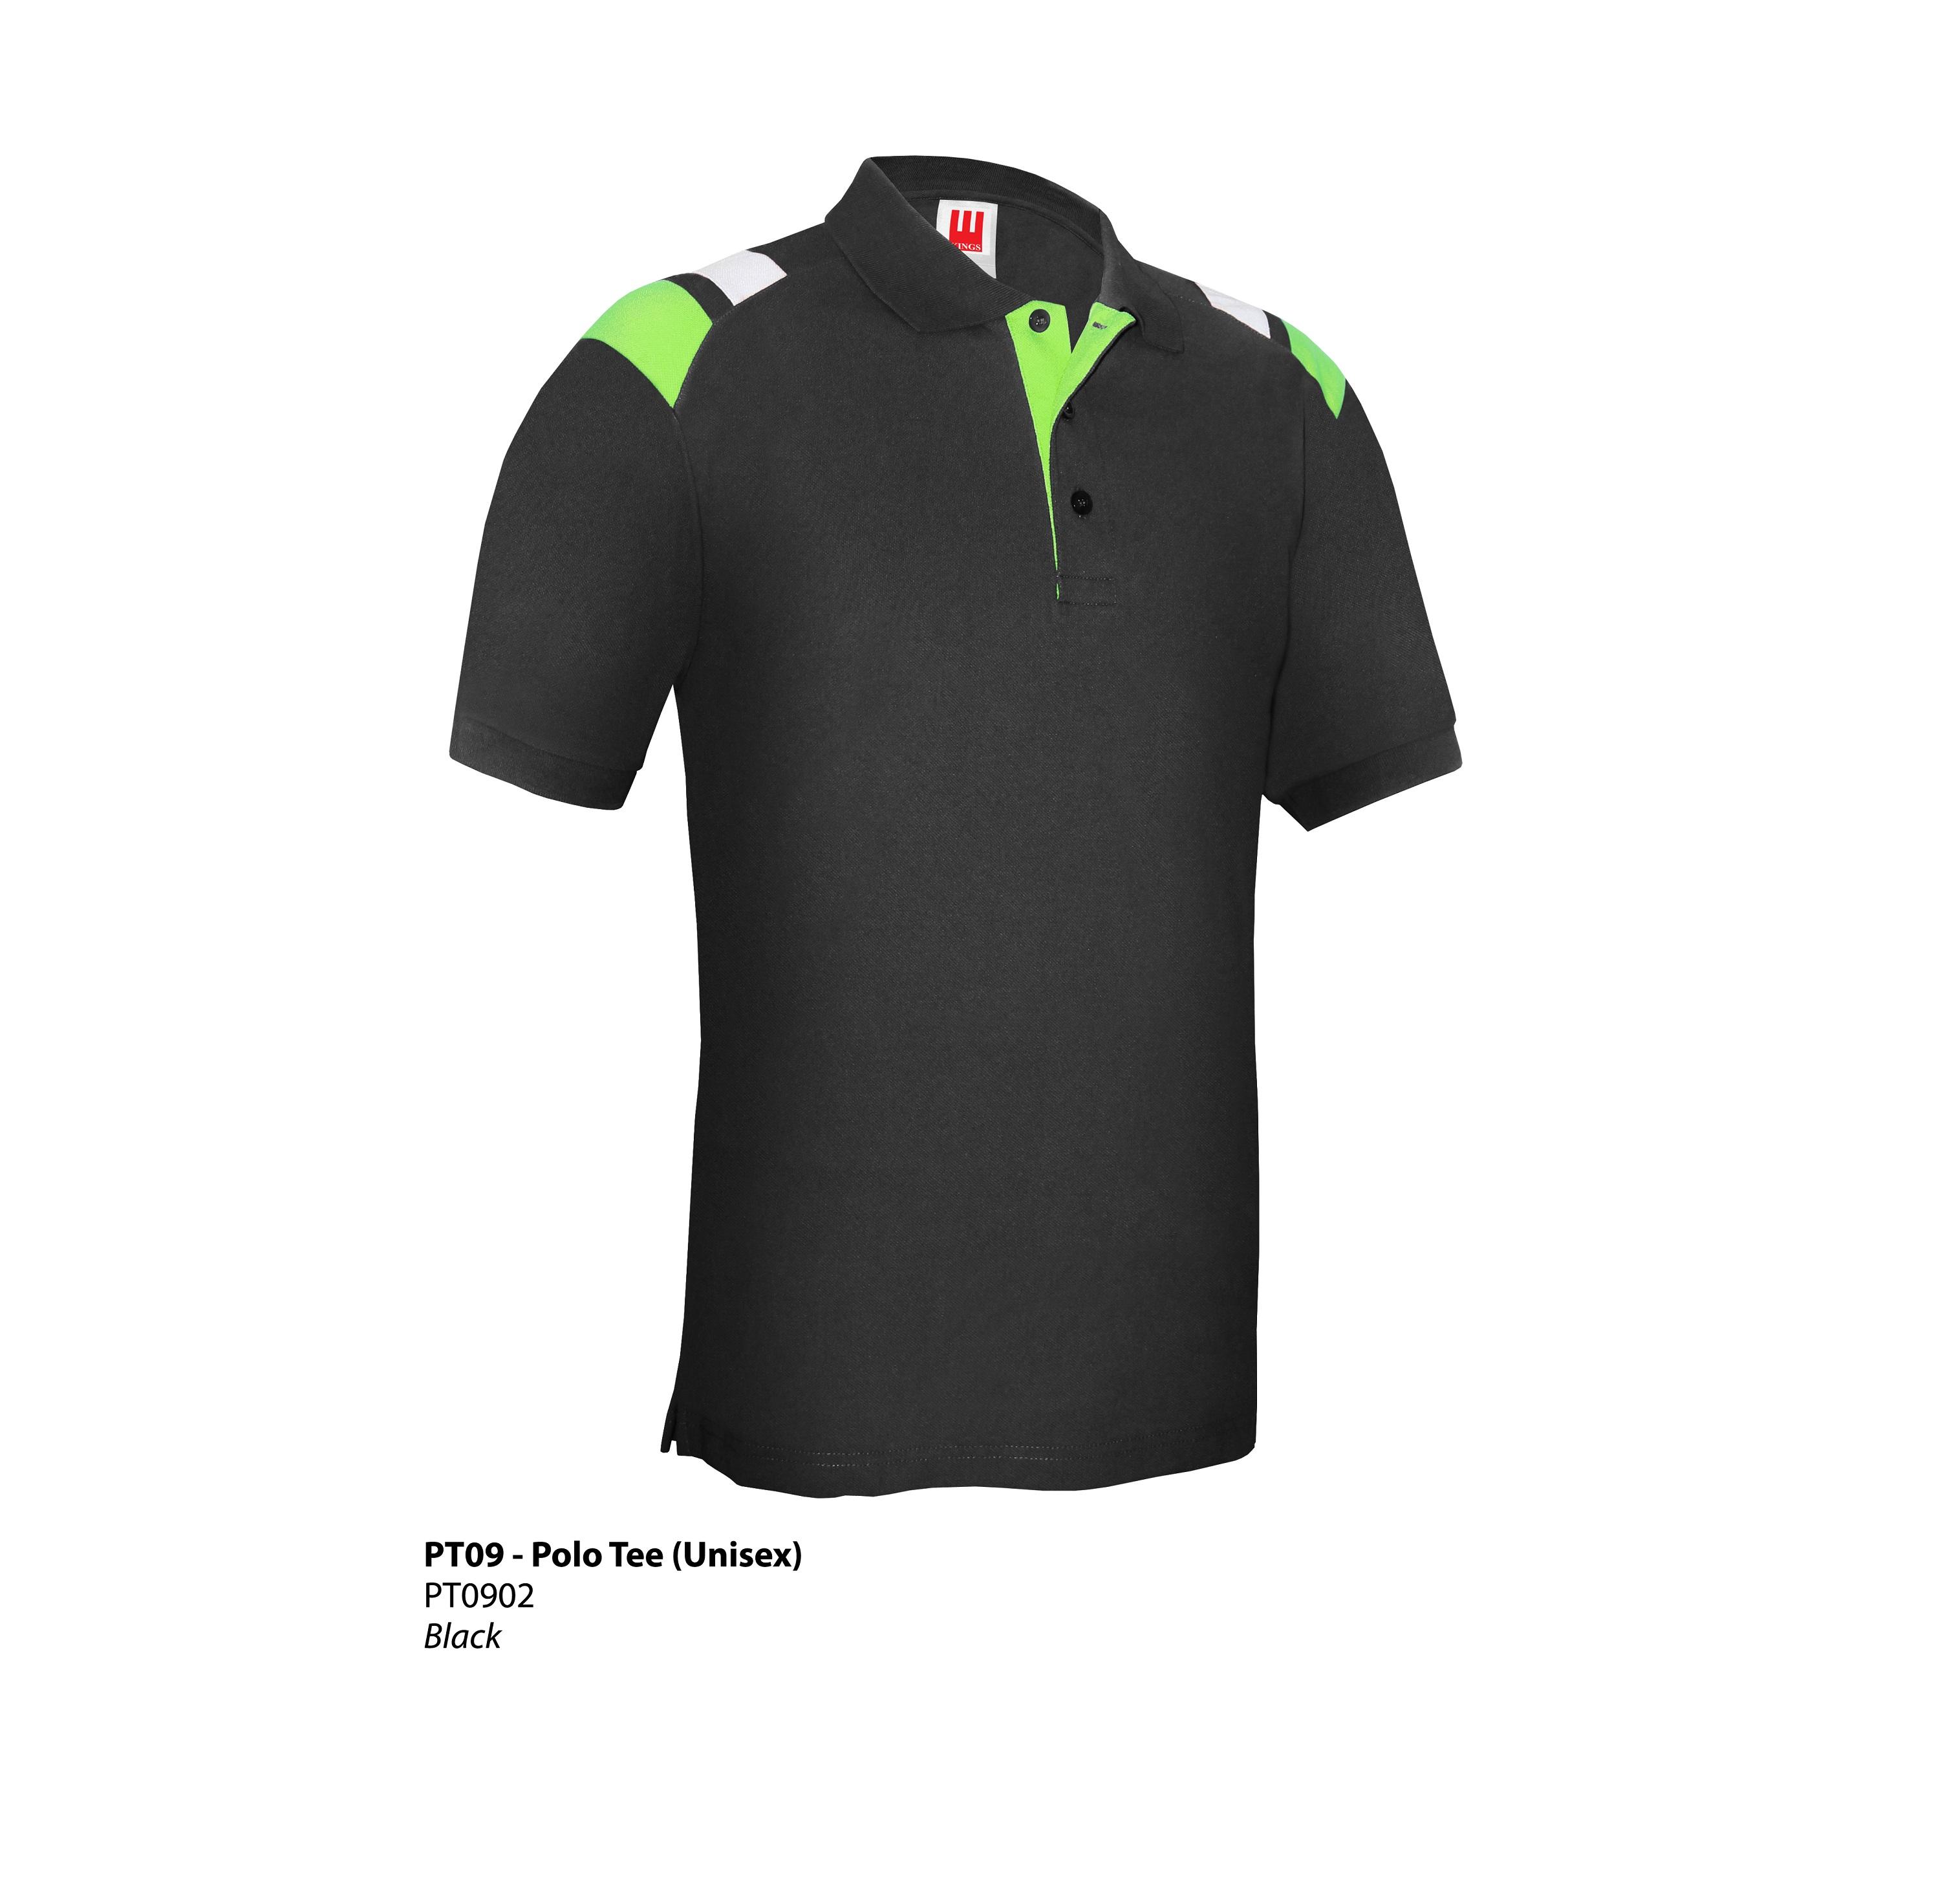 303e6d7c7748 Home   Kings   Polo Tee   POLO TEE PT09 – 4 Colors (Unisex)